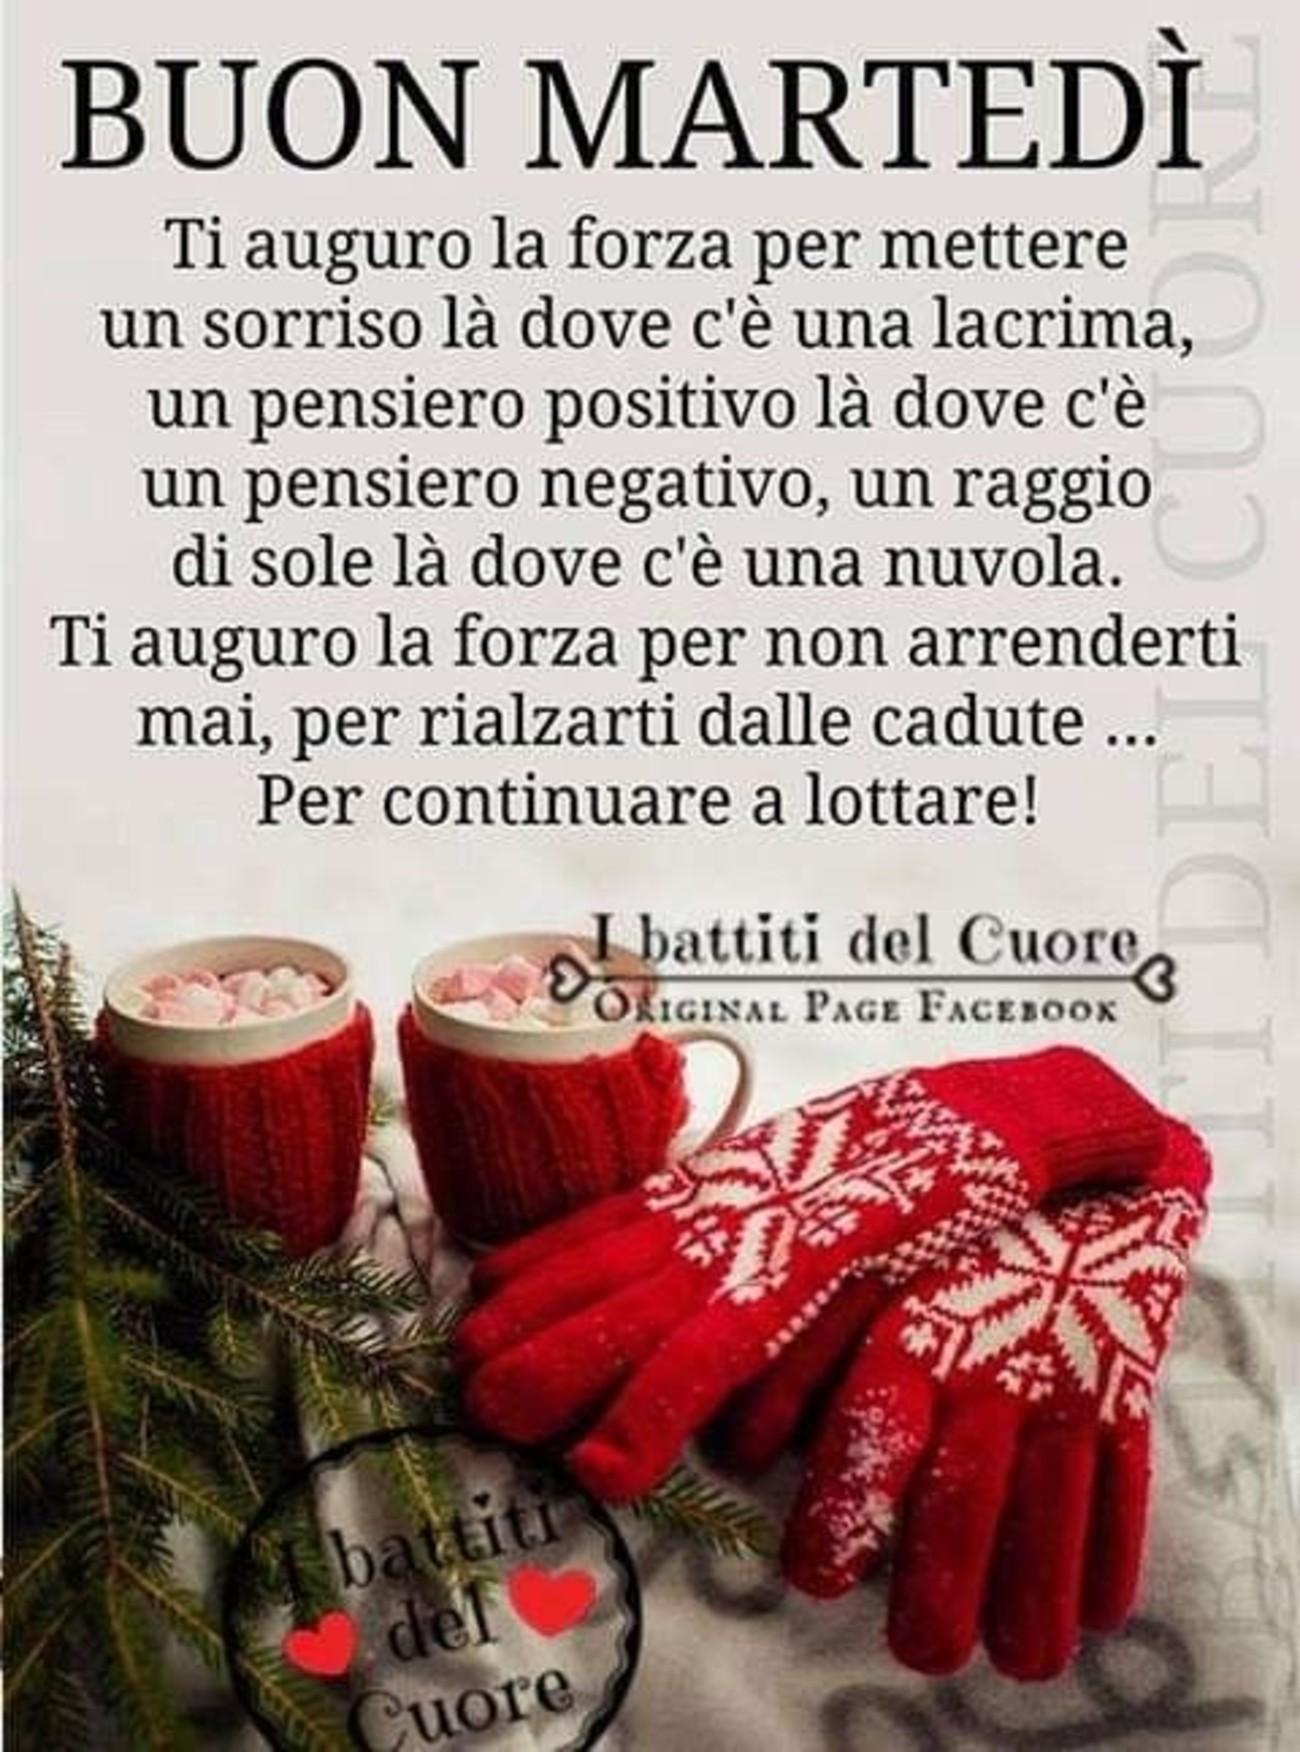 Immagini Gratis Per Buon Martedi A Tutti Immaginifacebook It